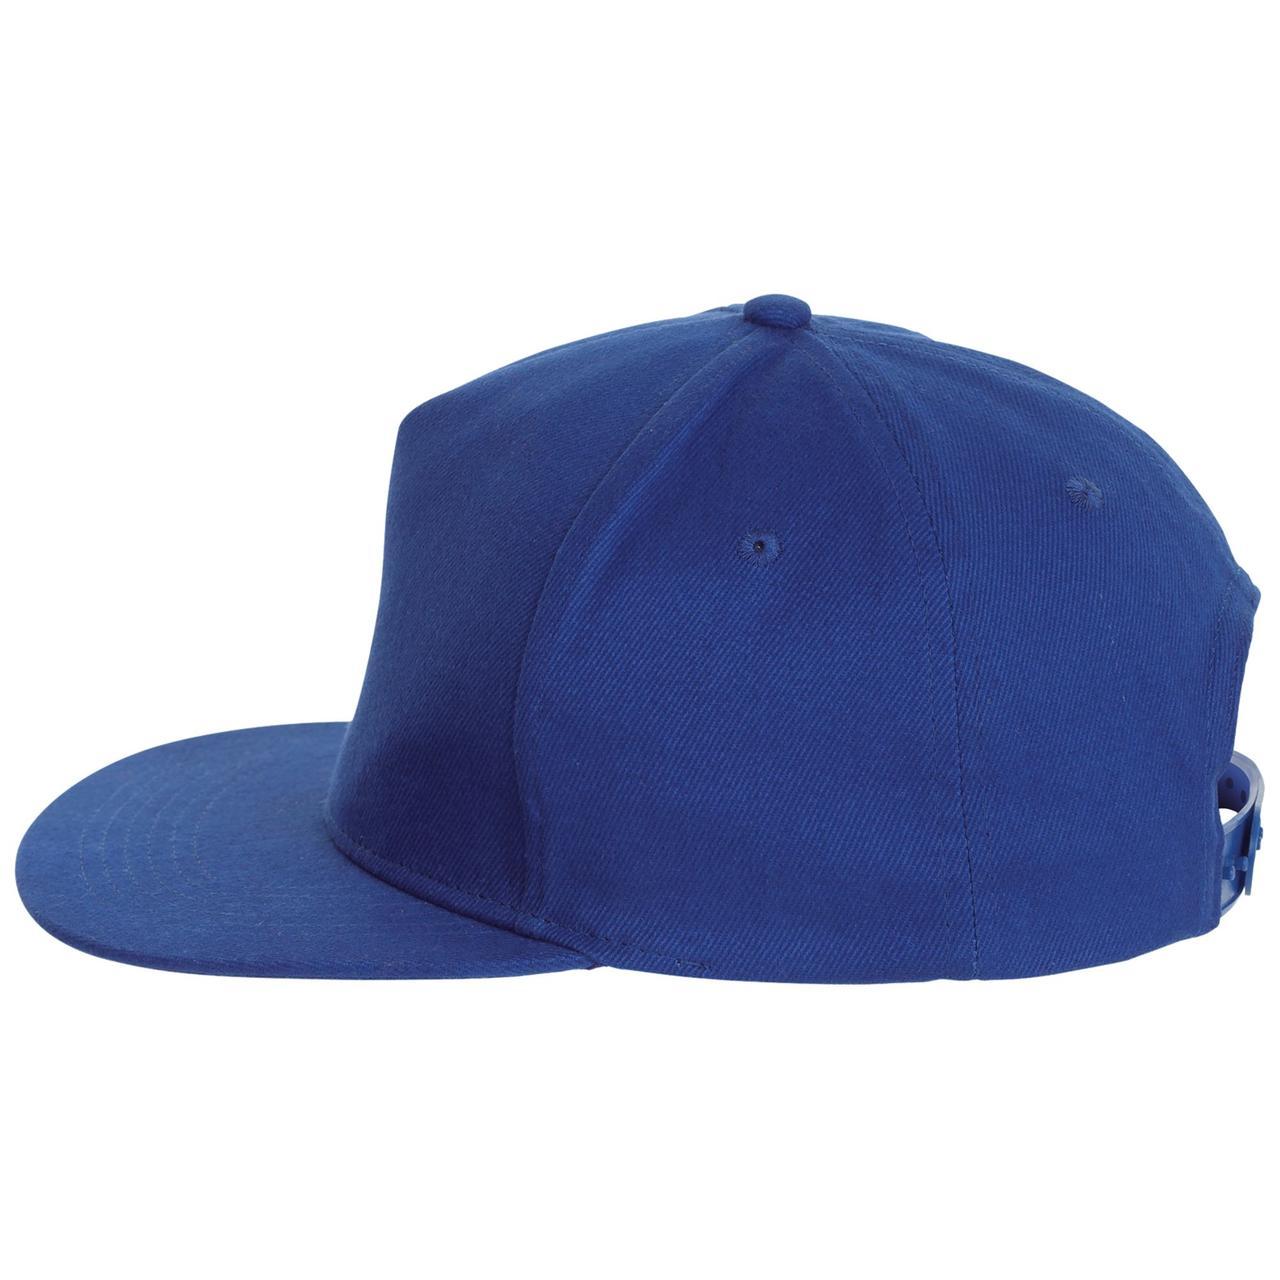 Бейсболка Sonic, ярко-синяя (артикул 01661241TUN)